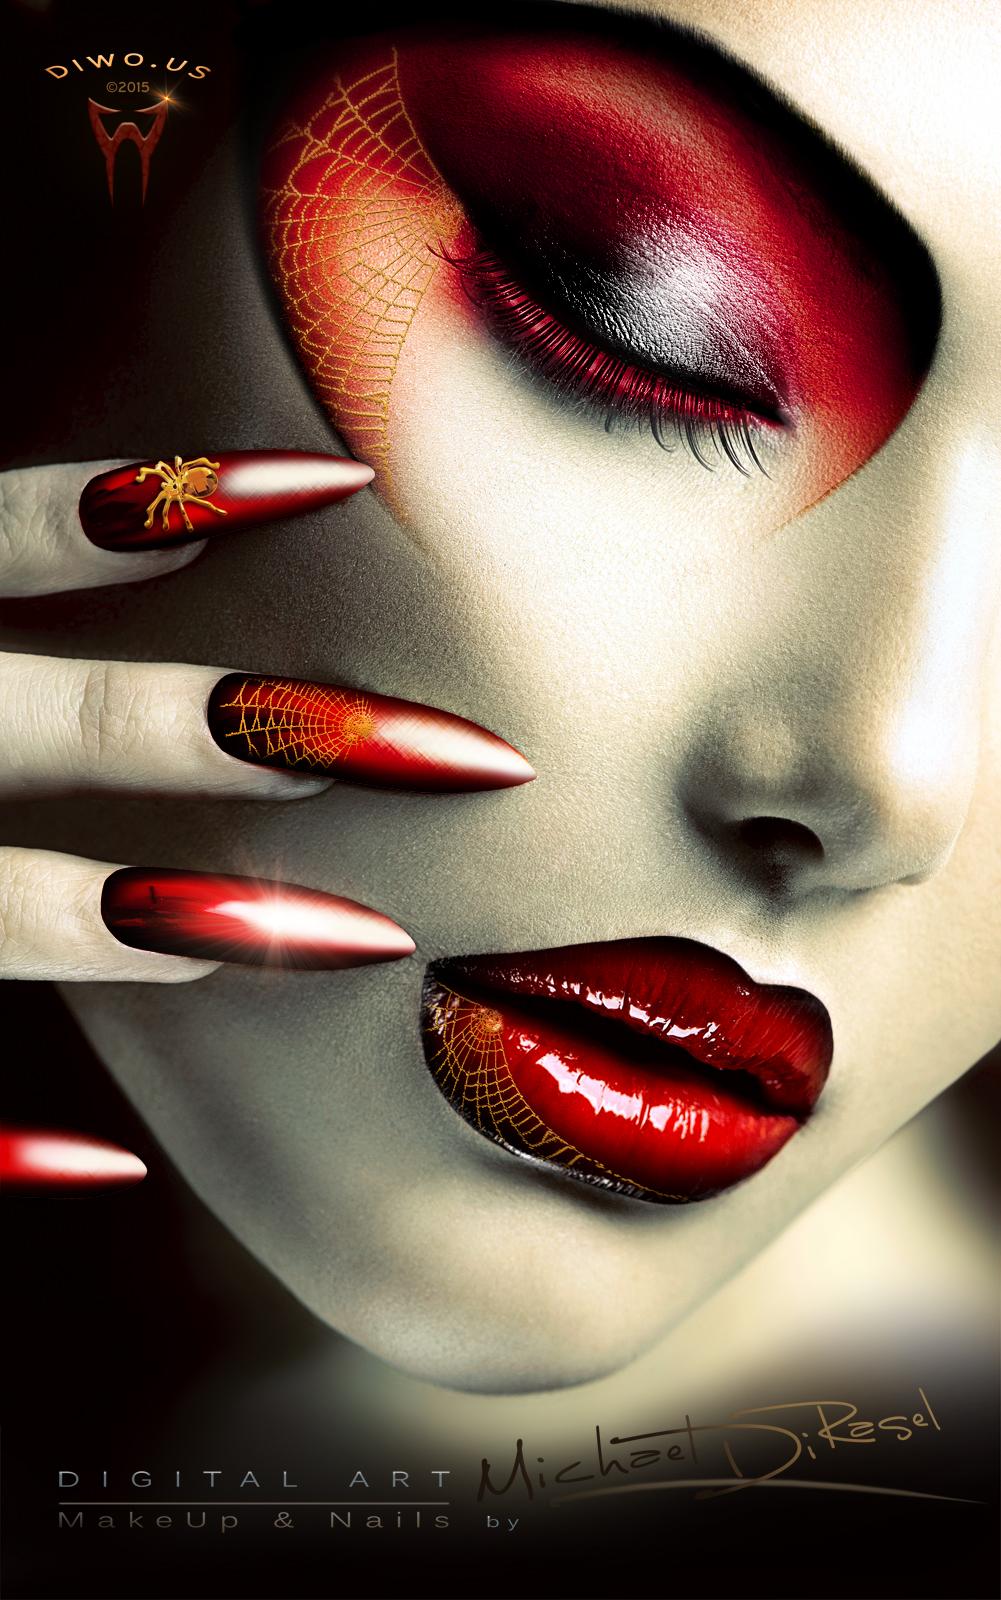 project: Digital MakeUp & Nails – Diwo.us